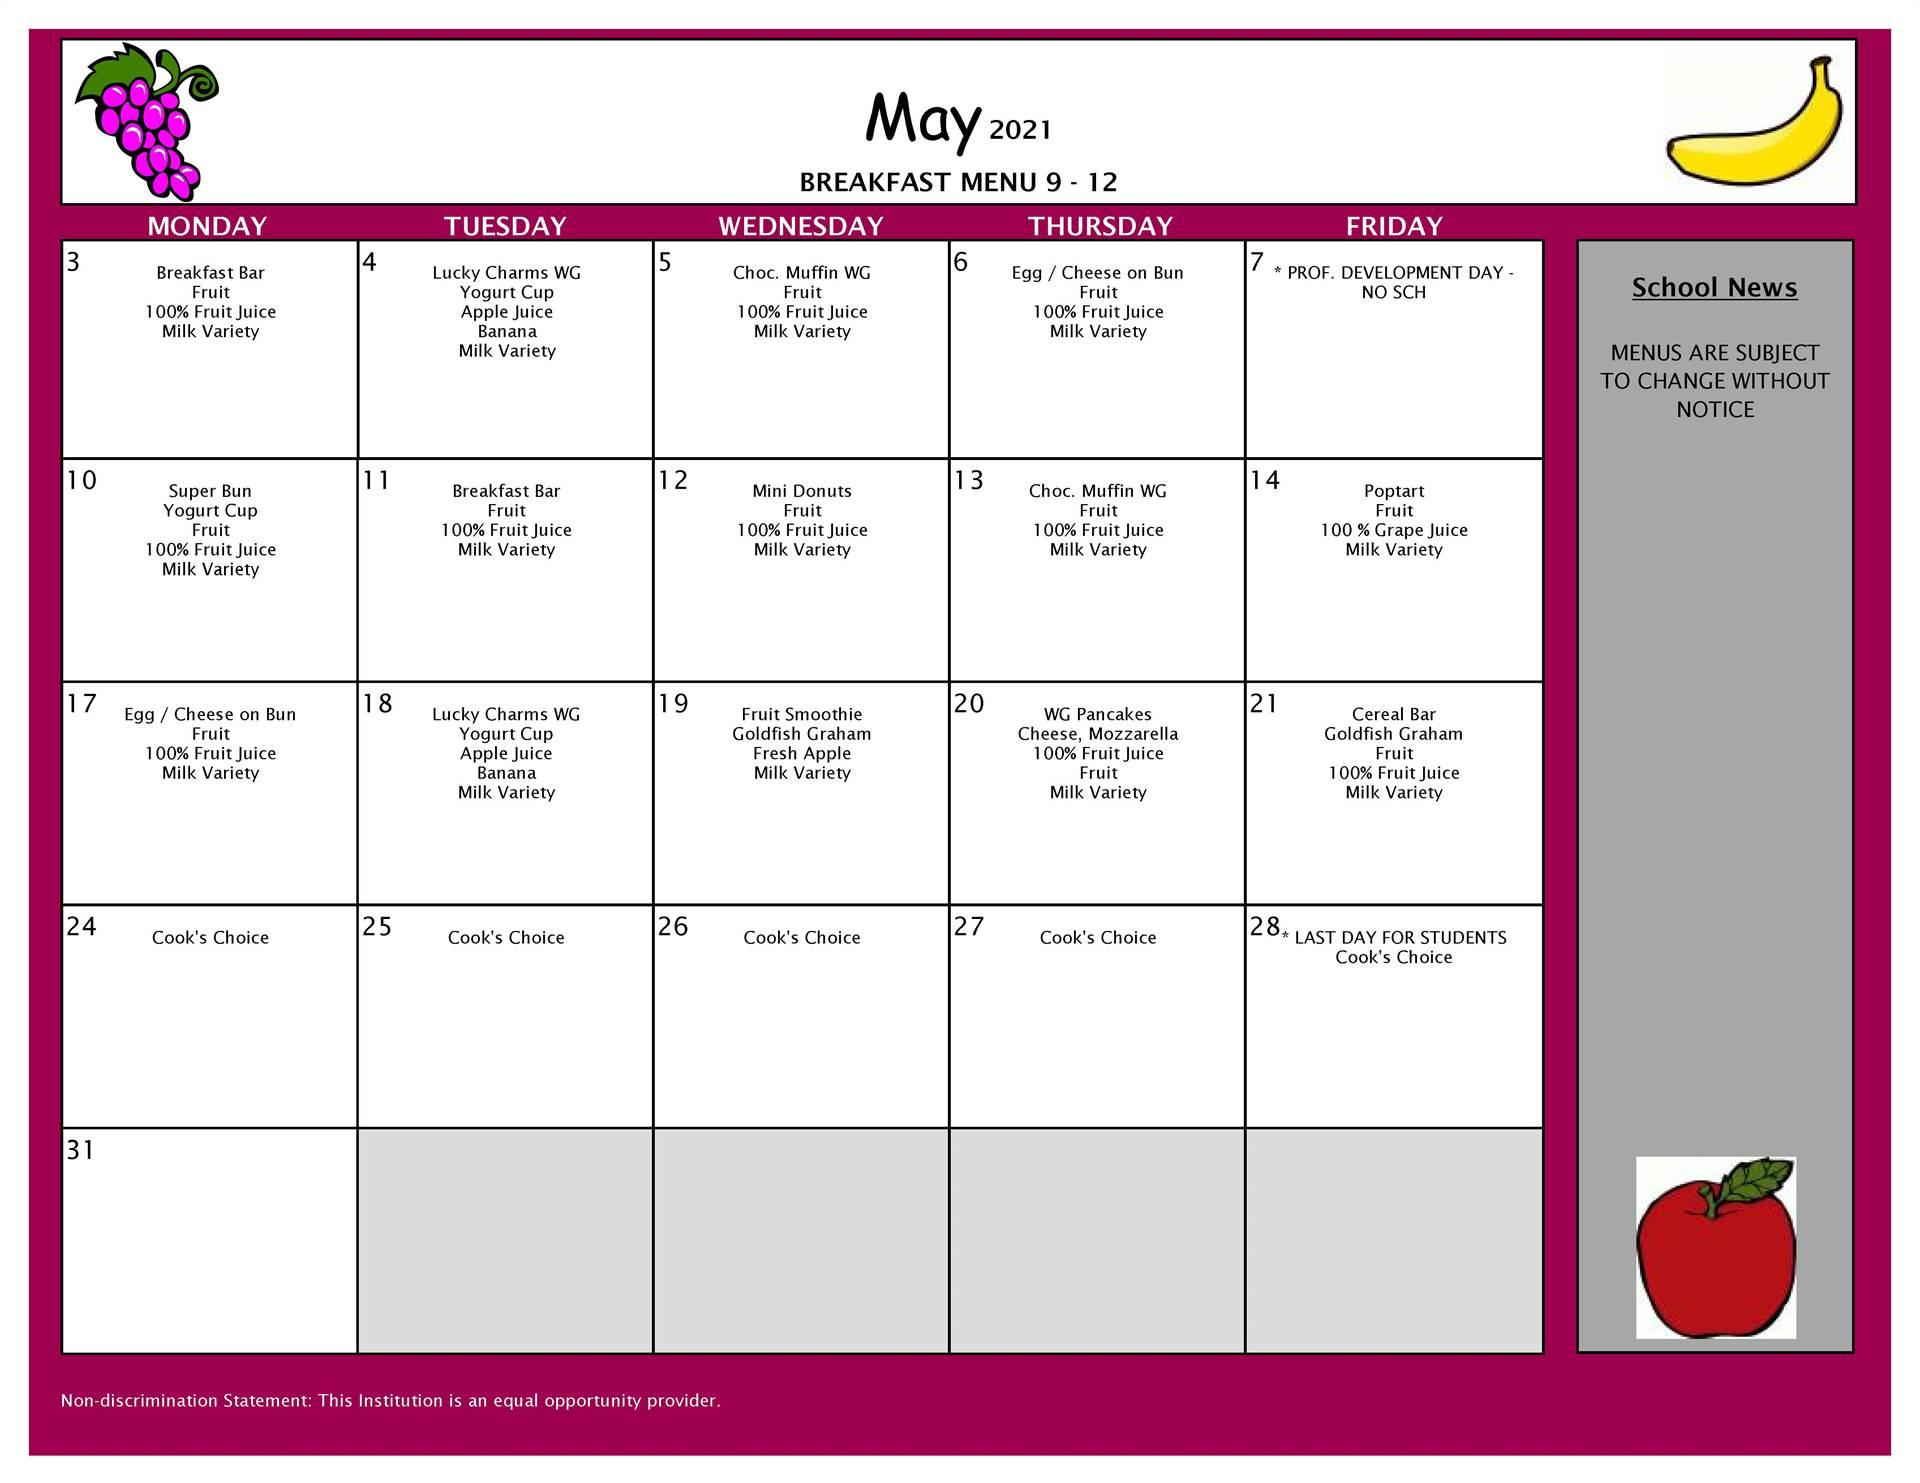 May Breakfast Menu 9-12